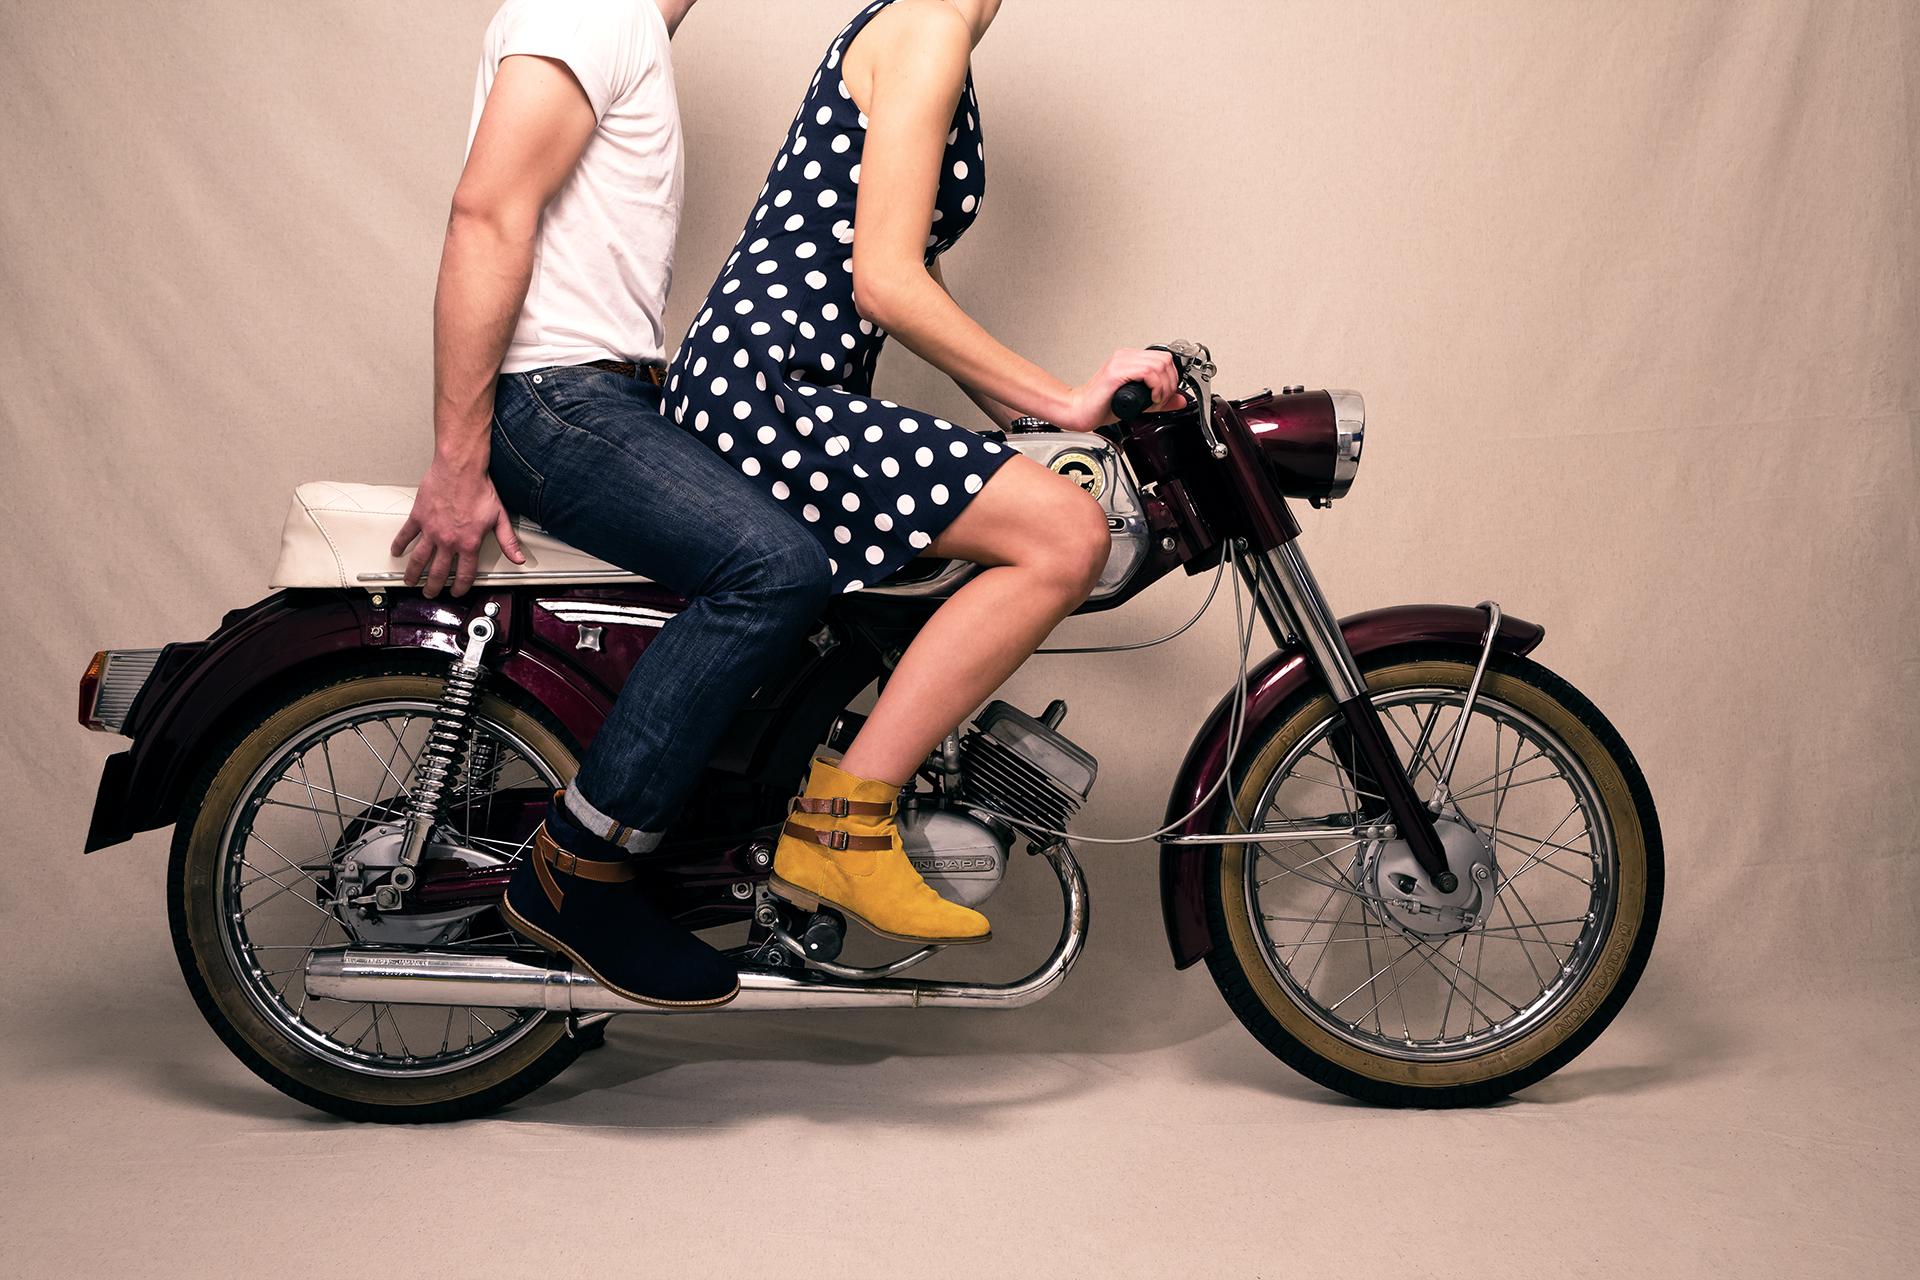 moto_mixte